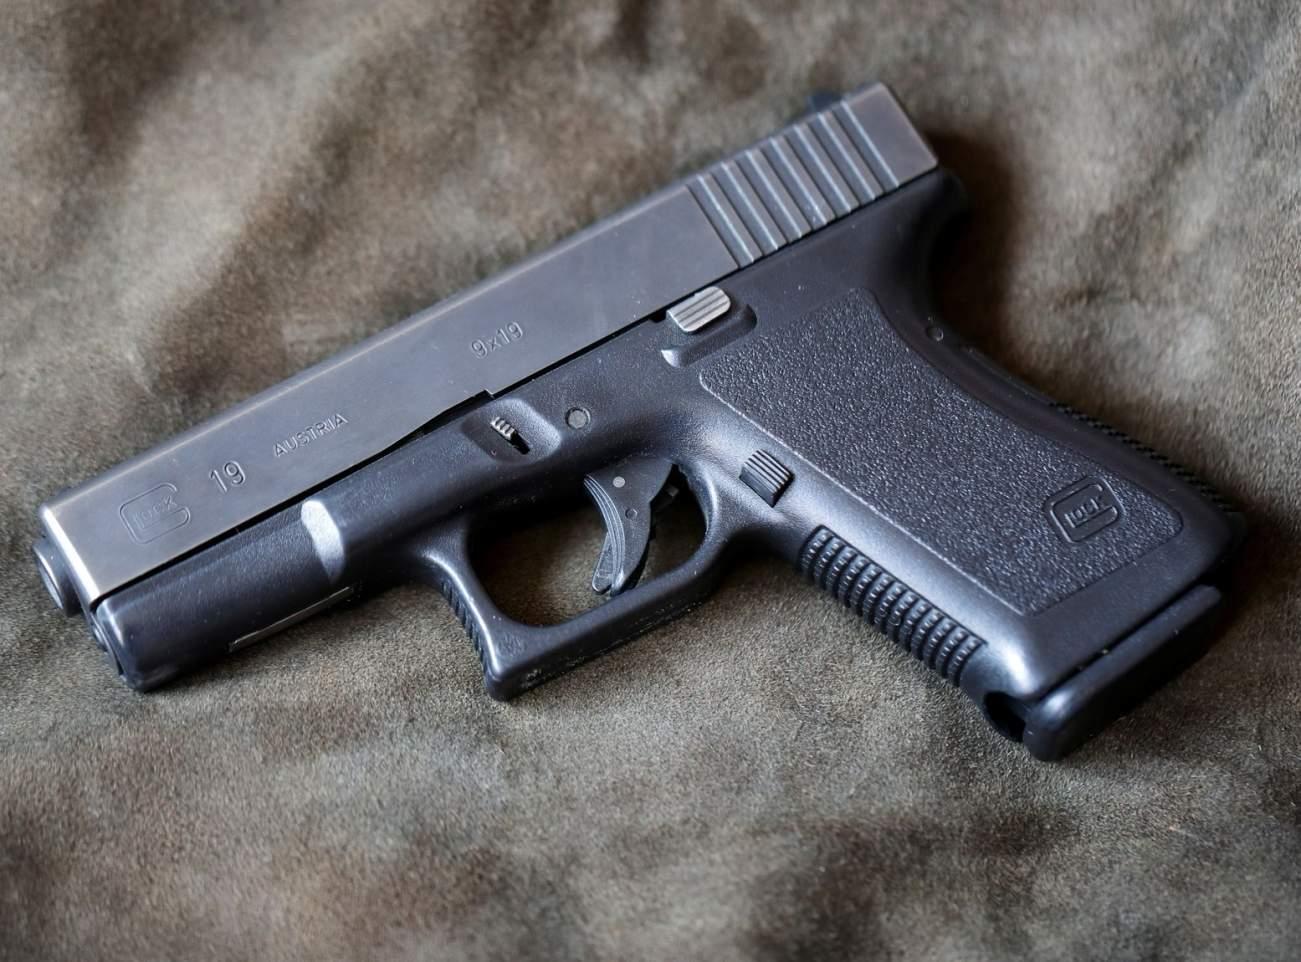 The Best Glock Gun 'Slides' On the Planet